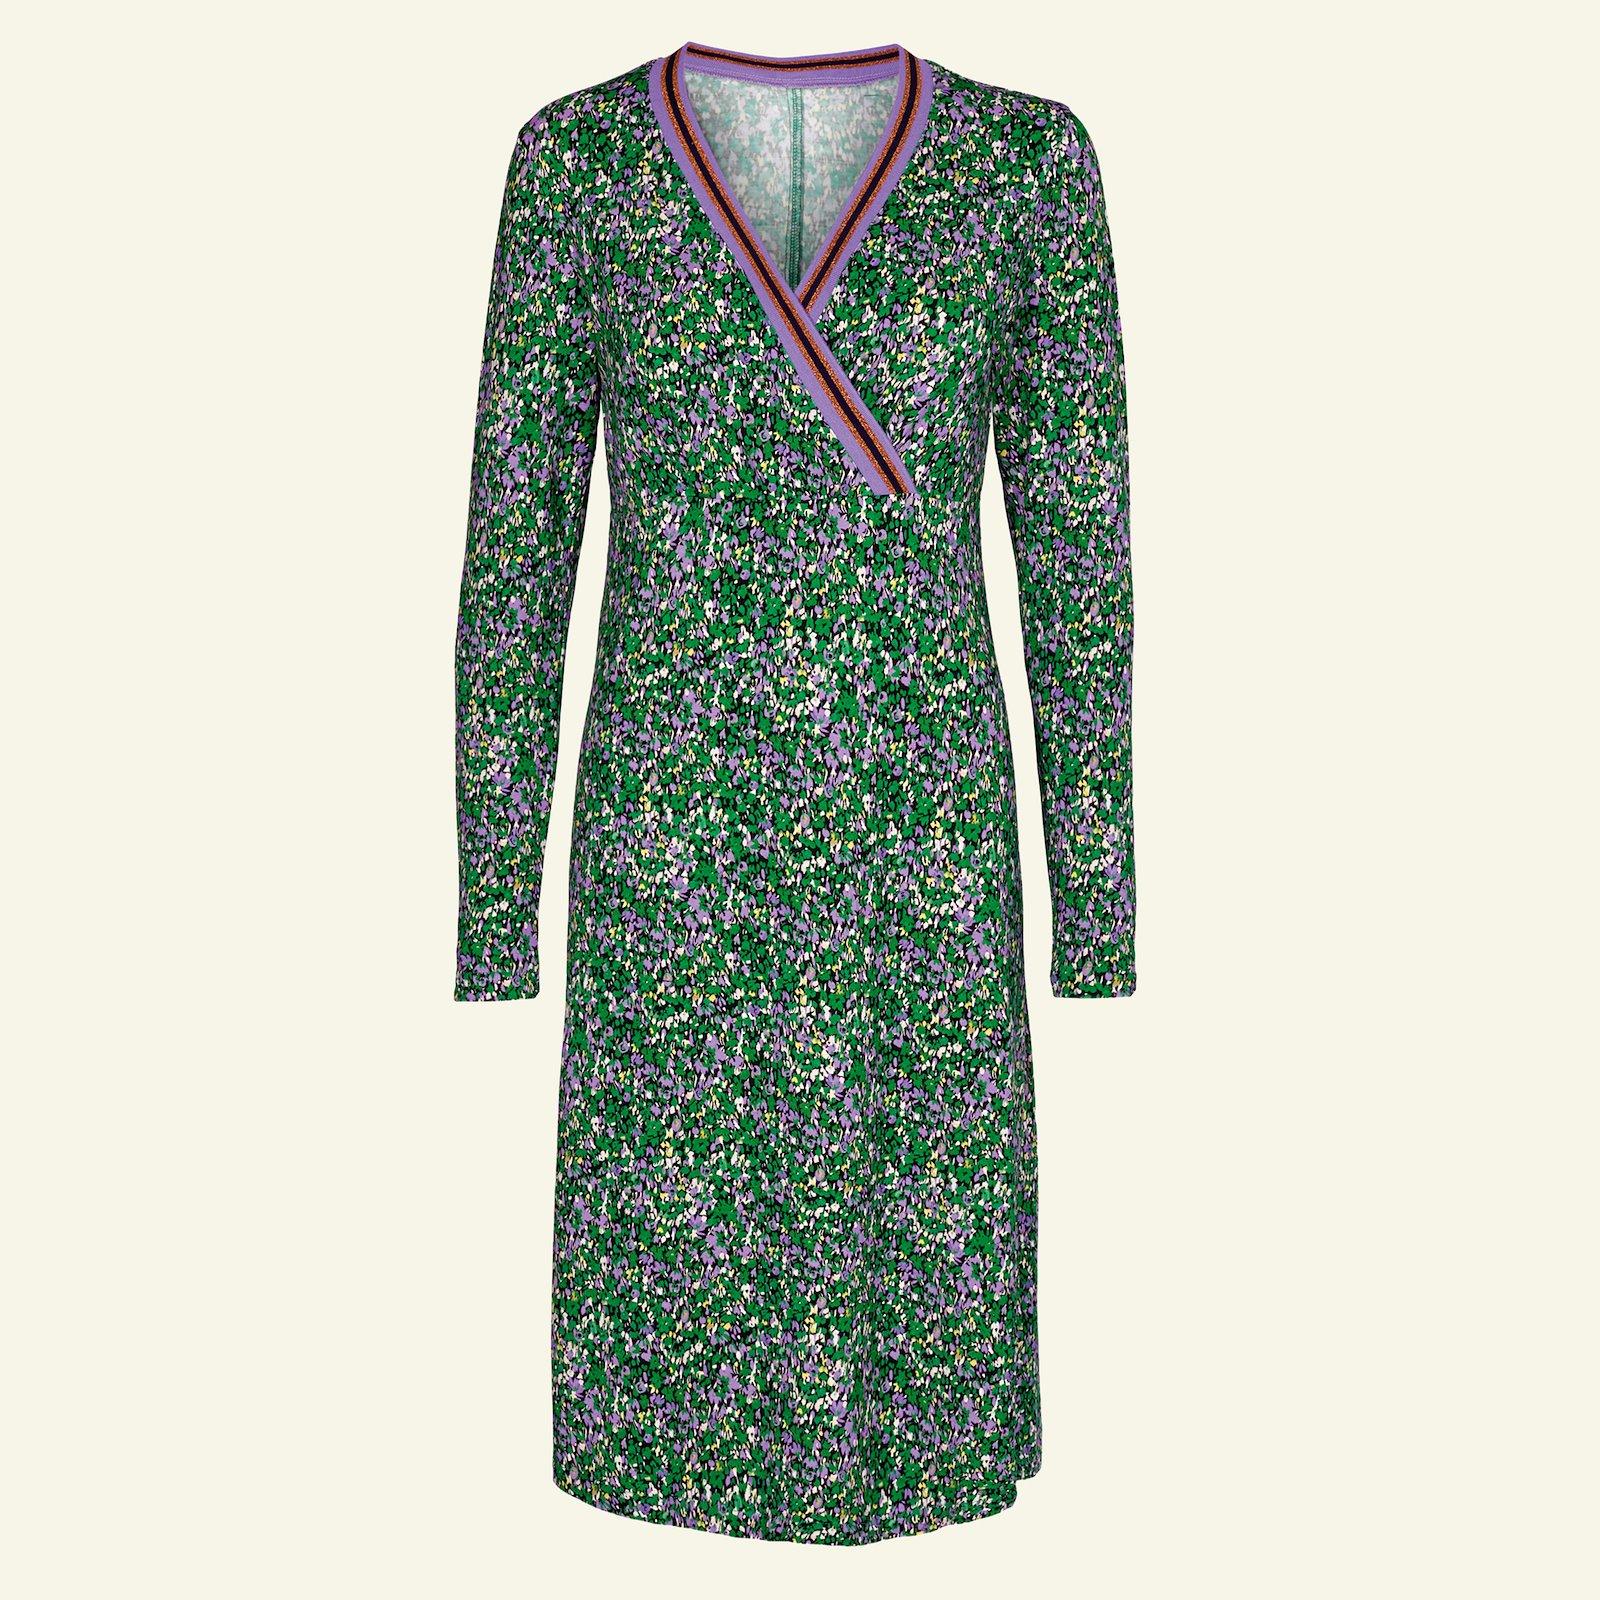 Viscose stretch jersey green with flower p23157_272591_96180_sskit